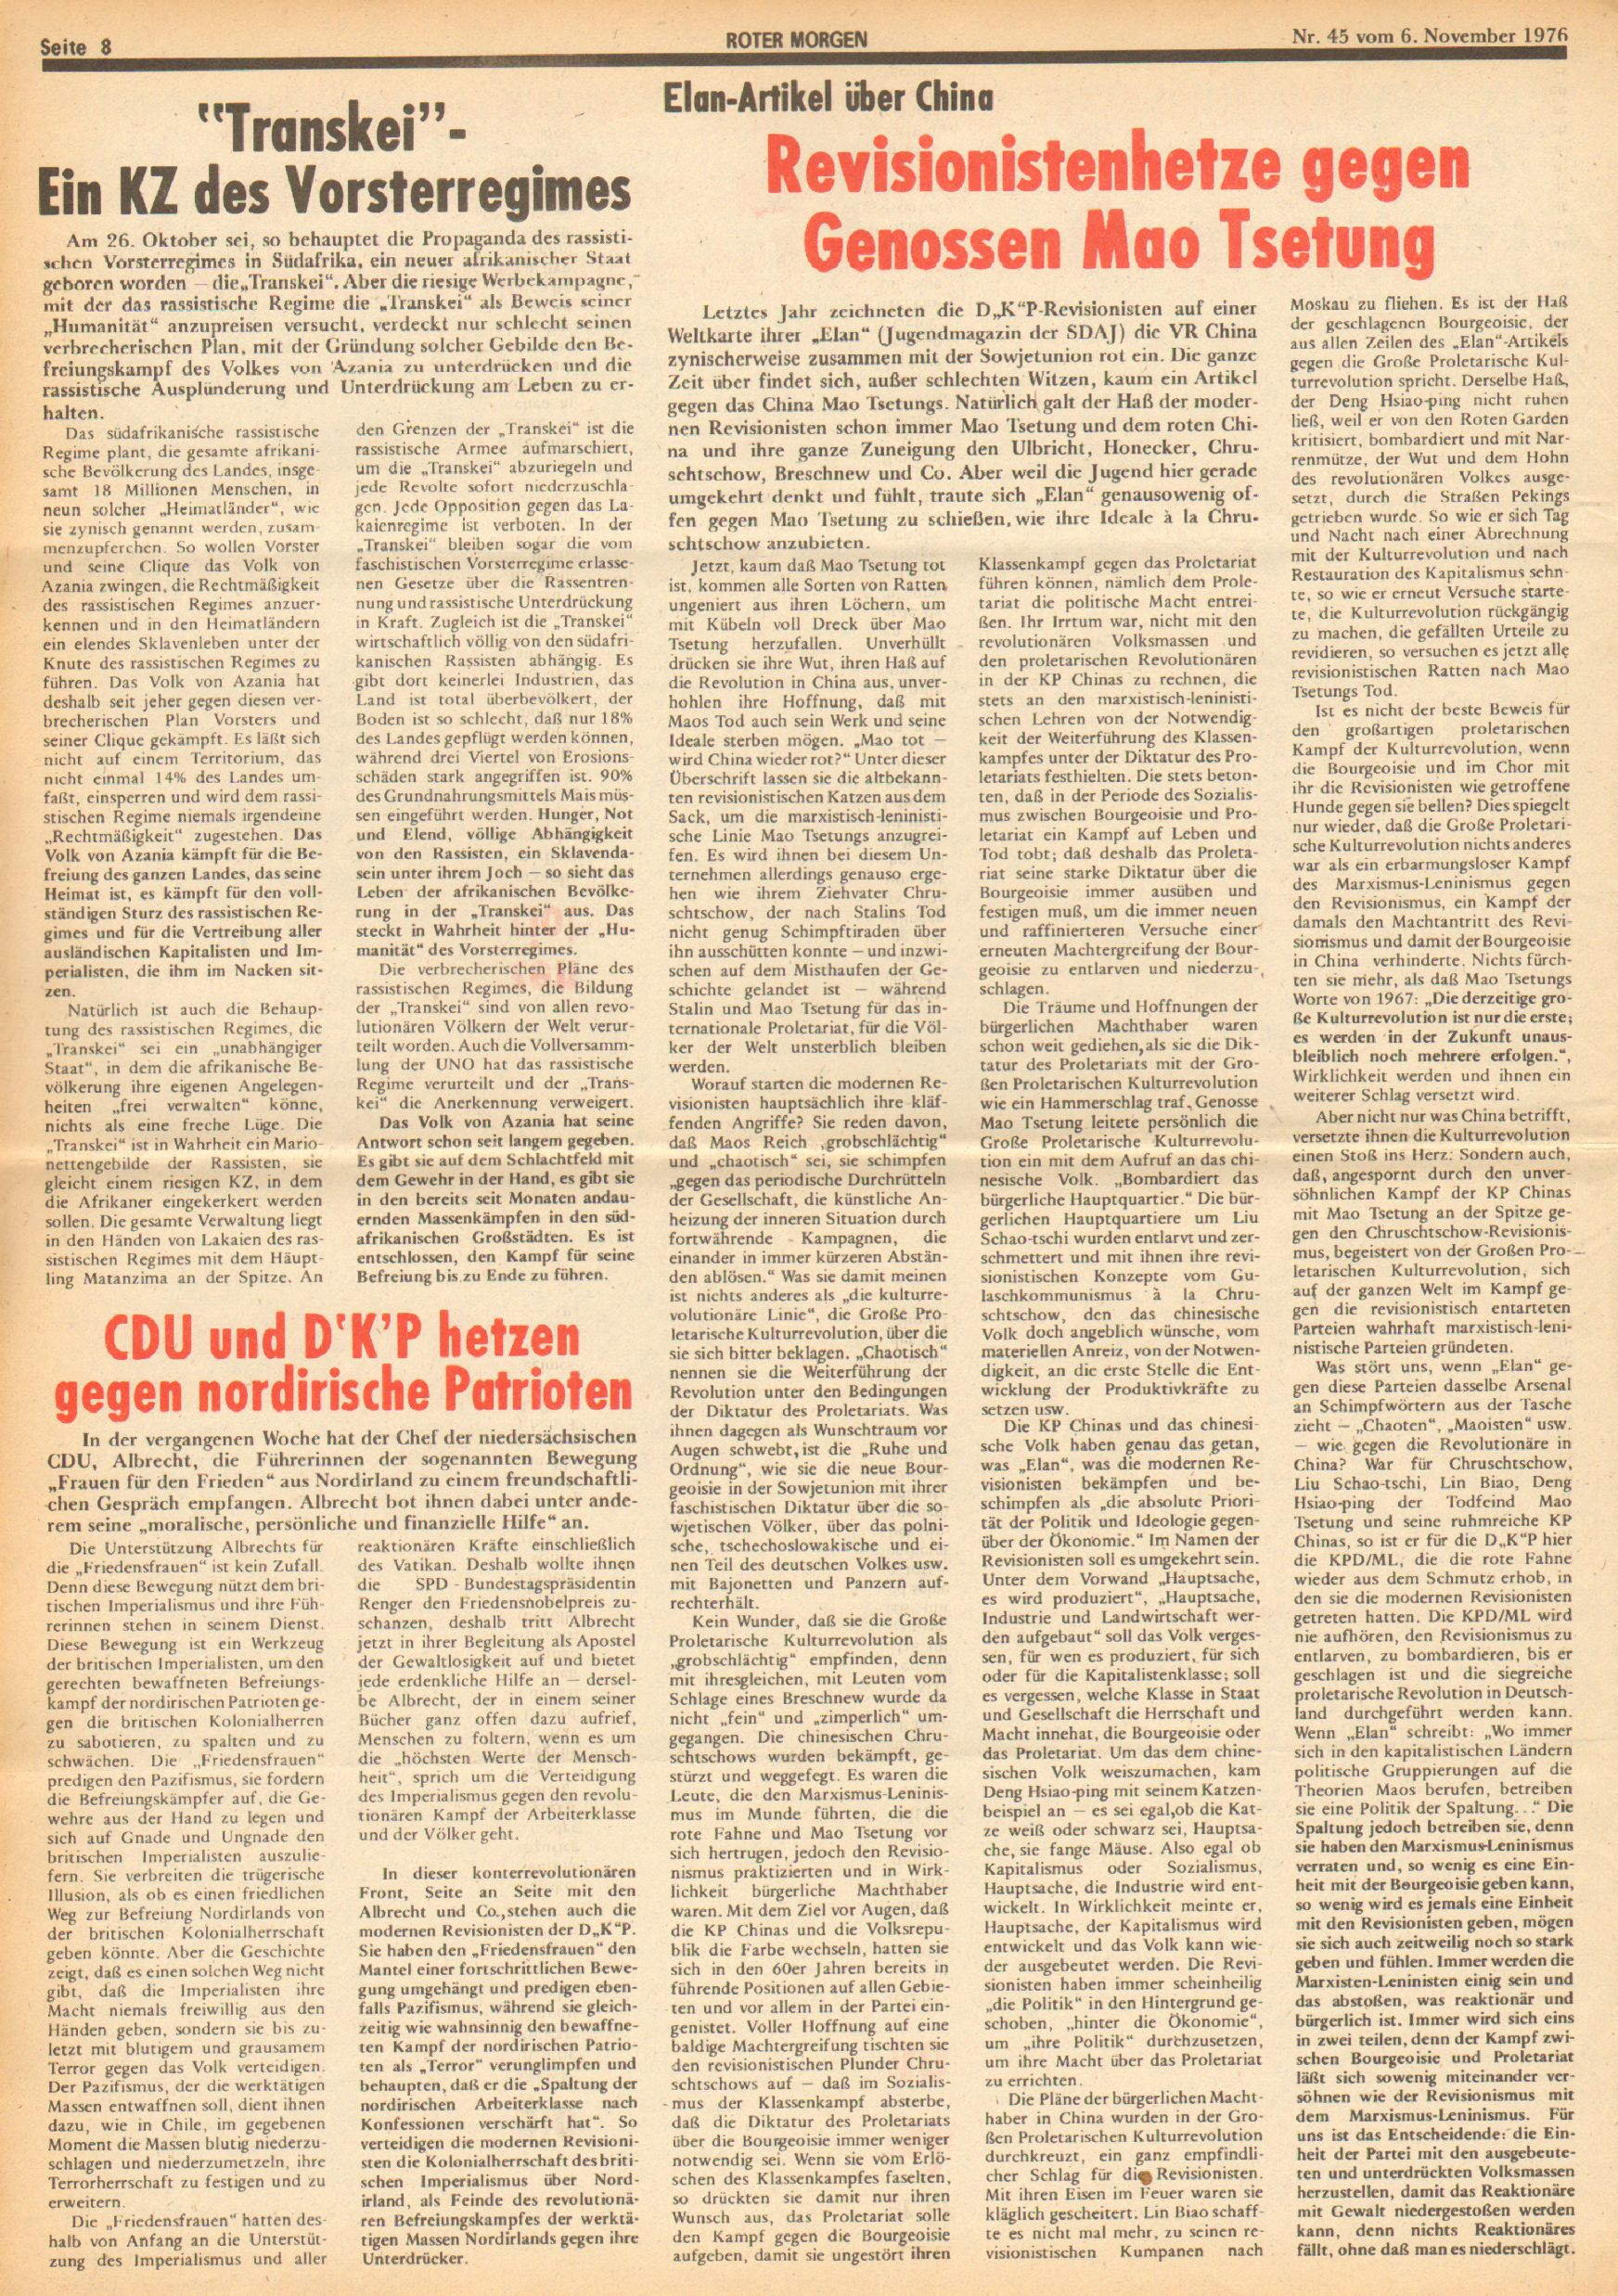 Roter Morgen, 10. Jg., 6. November 1976, Nr. 45, Seite 8